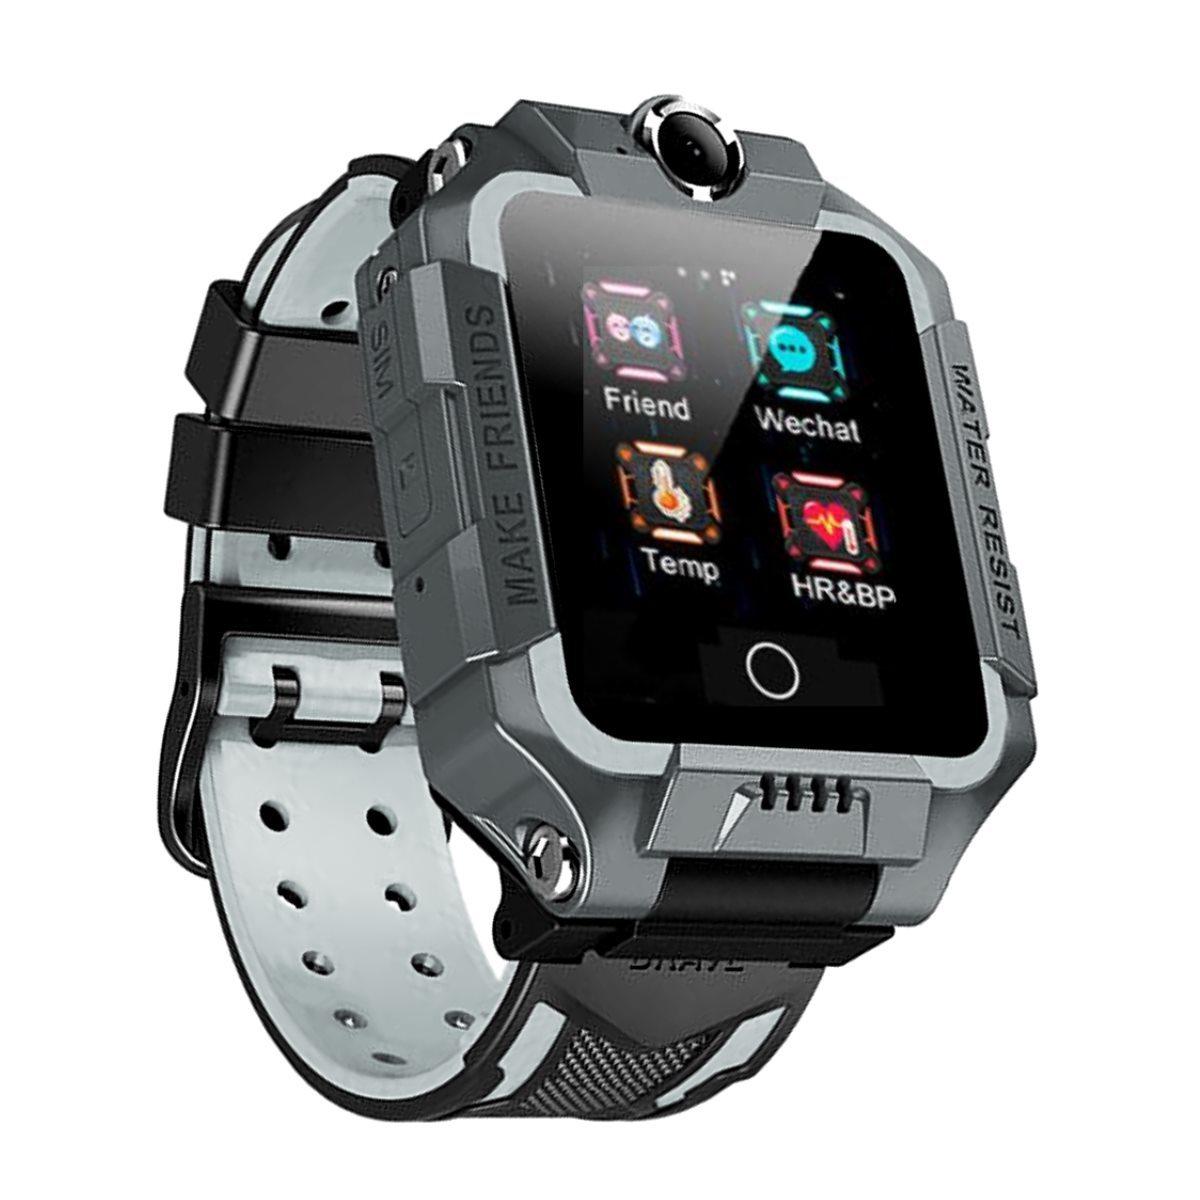 Каталог Часы Smart Baby Watch T10SL с видео и термометром Смарт_часы_T10SL_Black_3.jpg